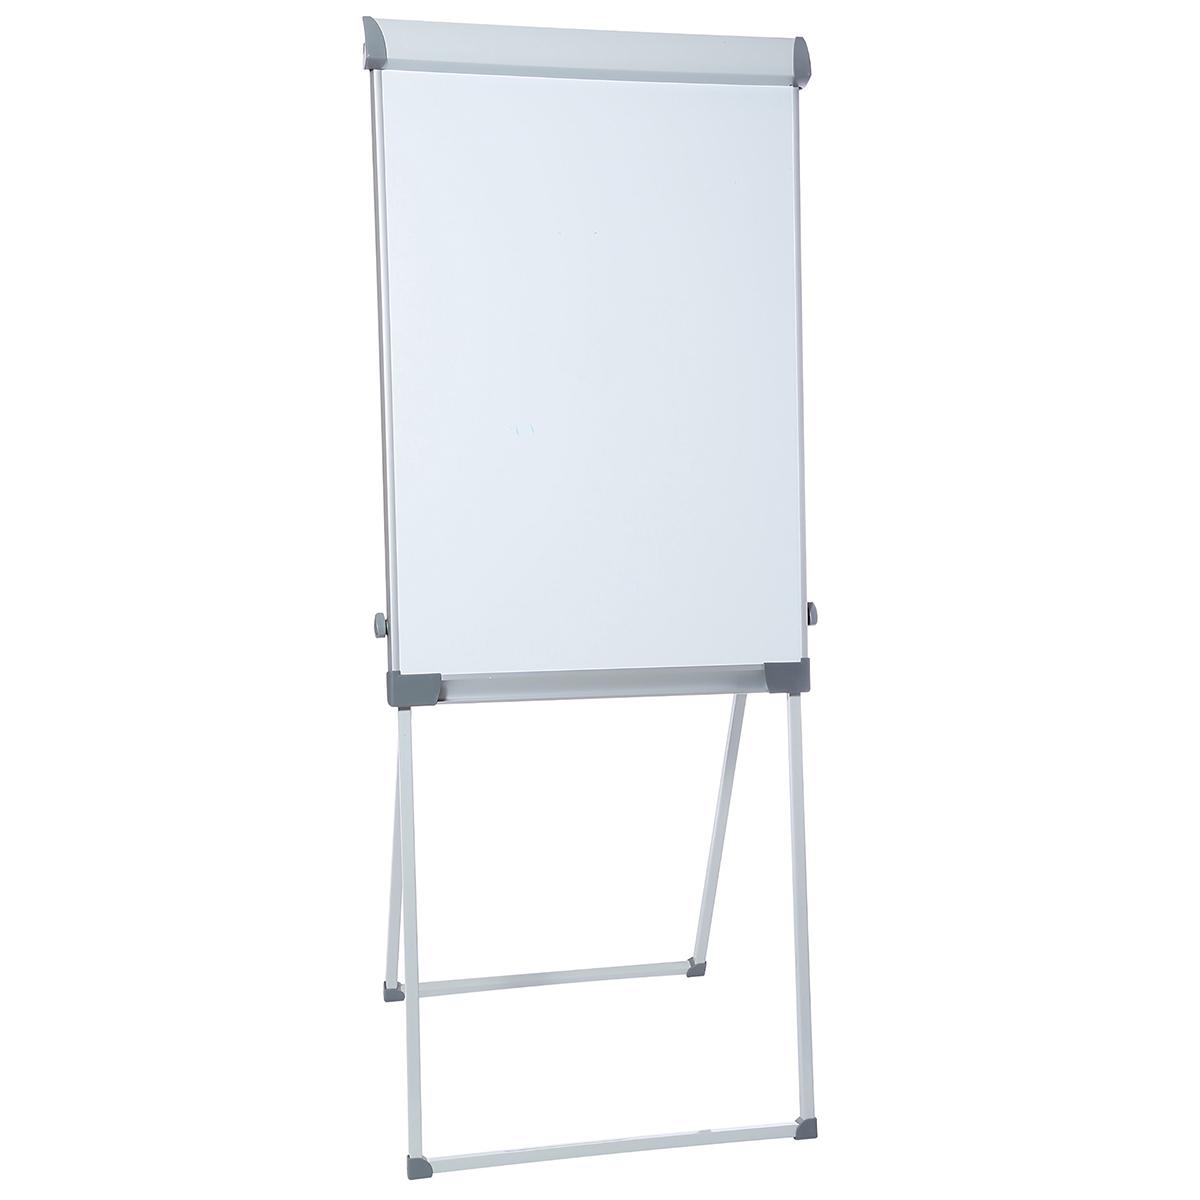 Dahle Professional Flip Chart Easel 68x105cm